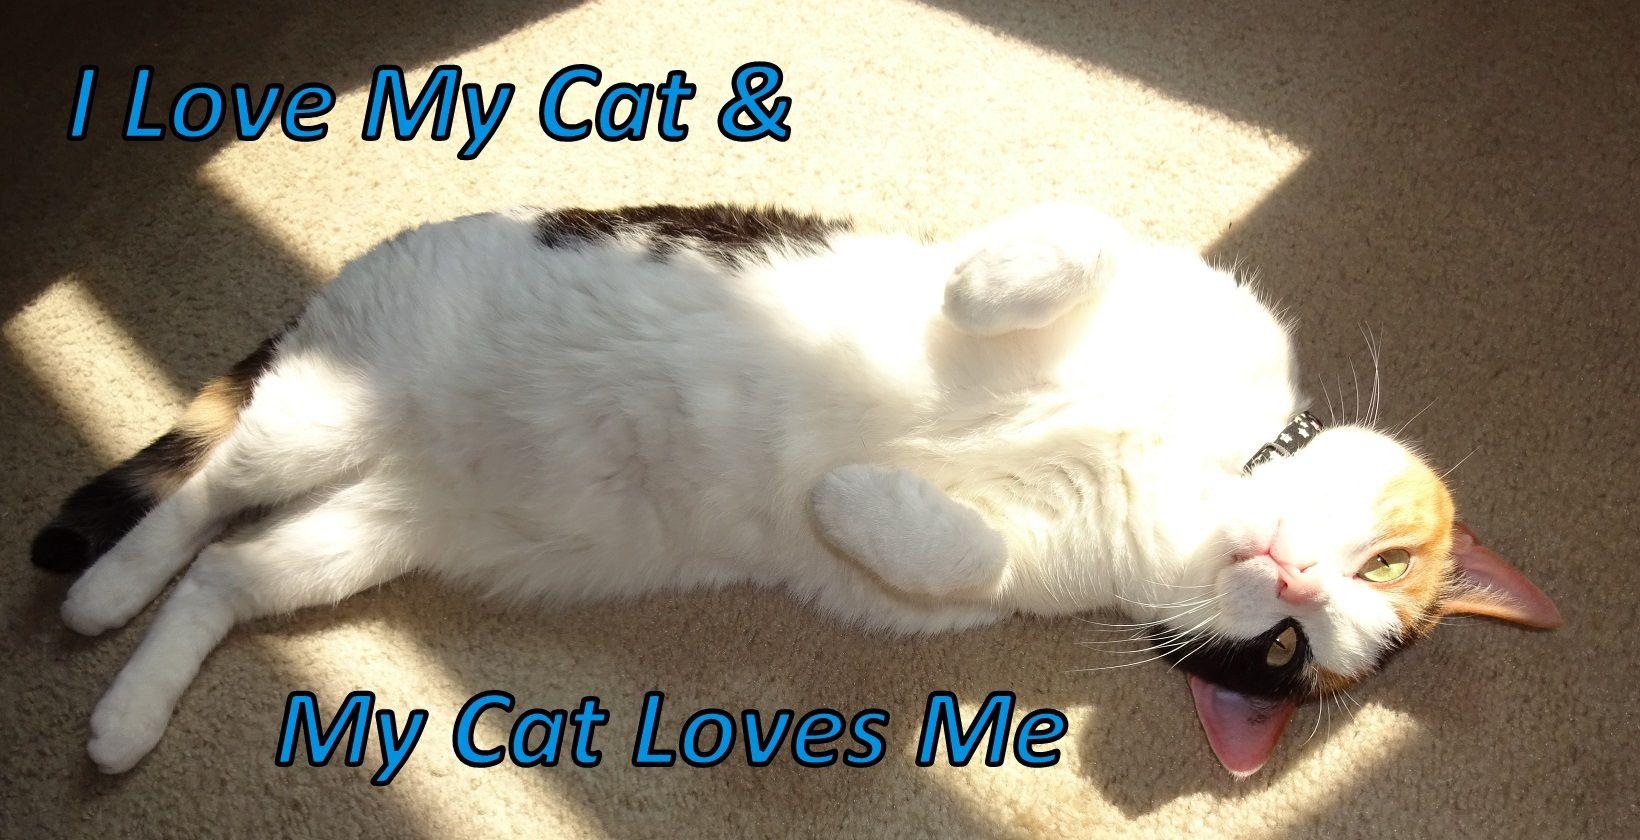 Google themes meme -  I Love My Cat My Cat Loves Me My Sweet Girl Bonney